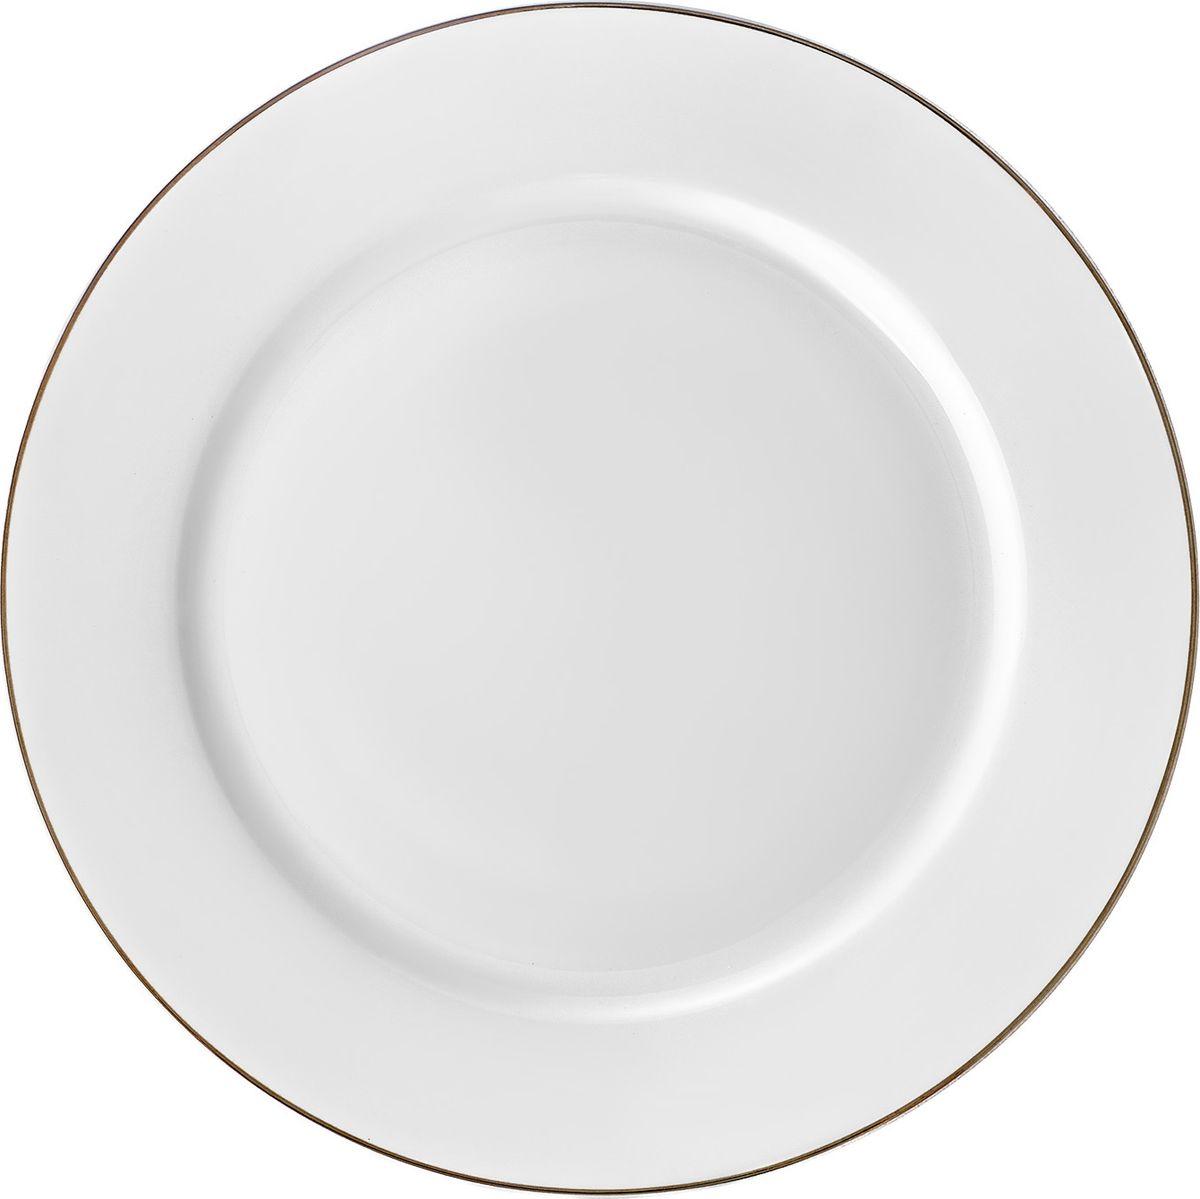 Набор тарелок 6 шт. десертная, 20,5 см, костяной фарфор Alpino, ALP020WE301